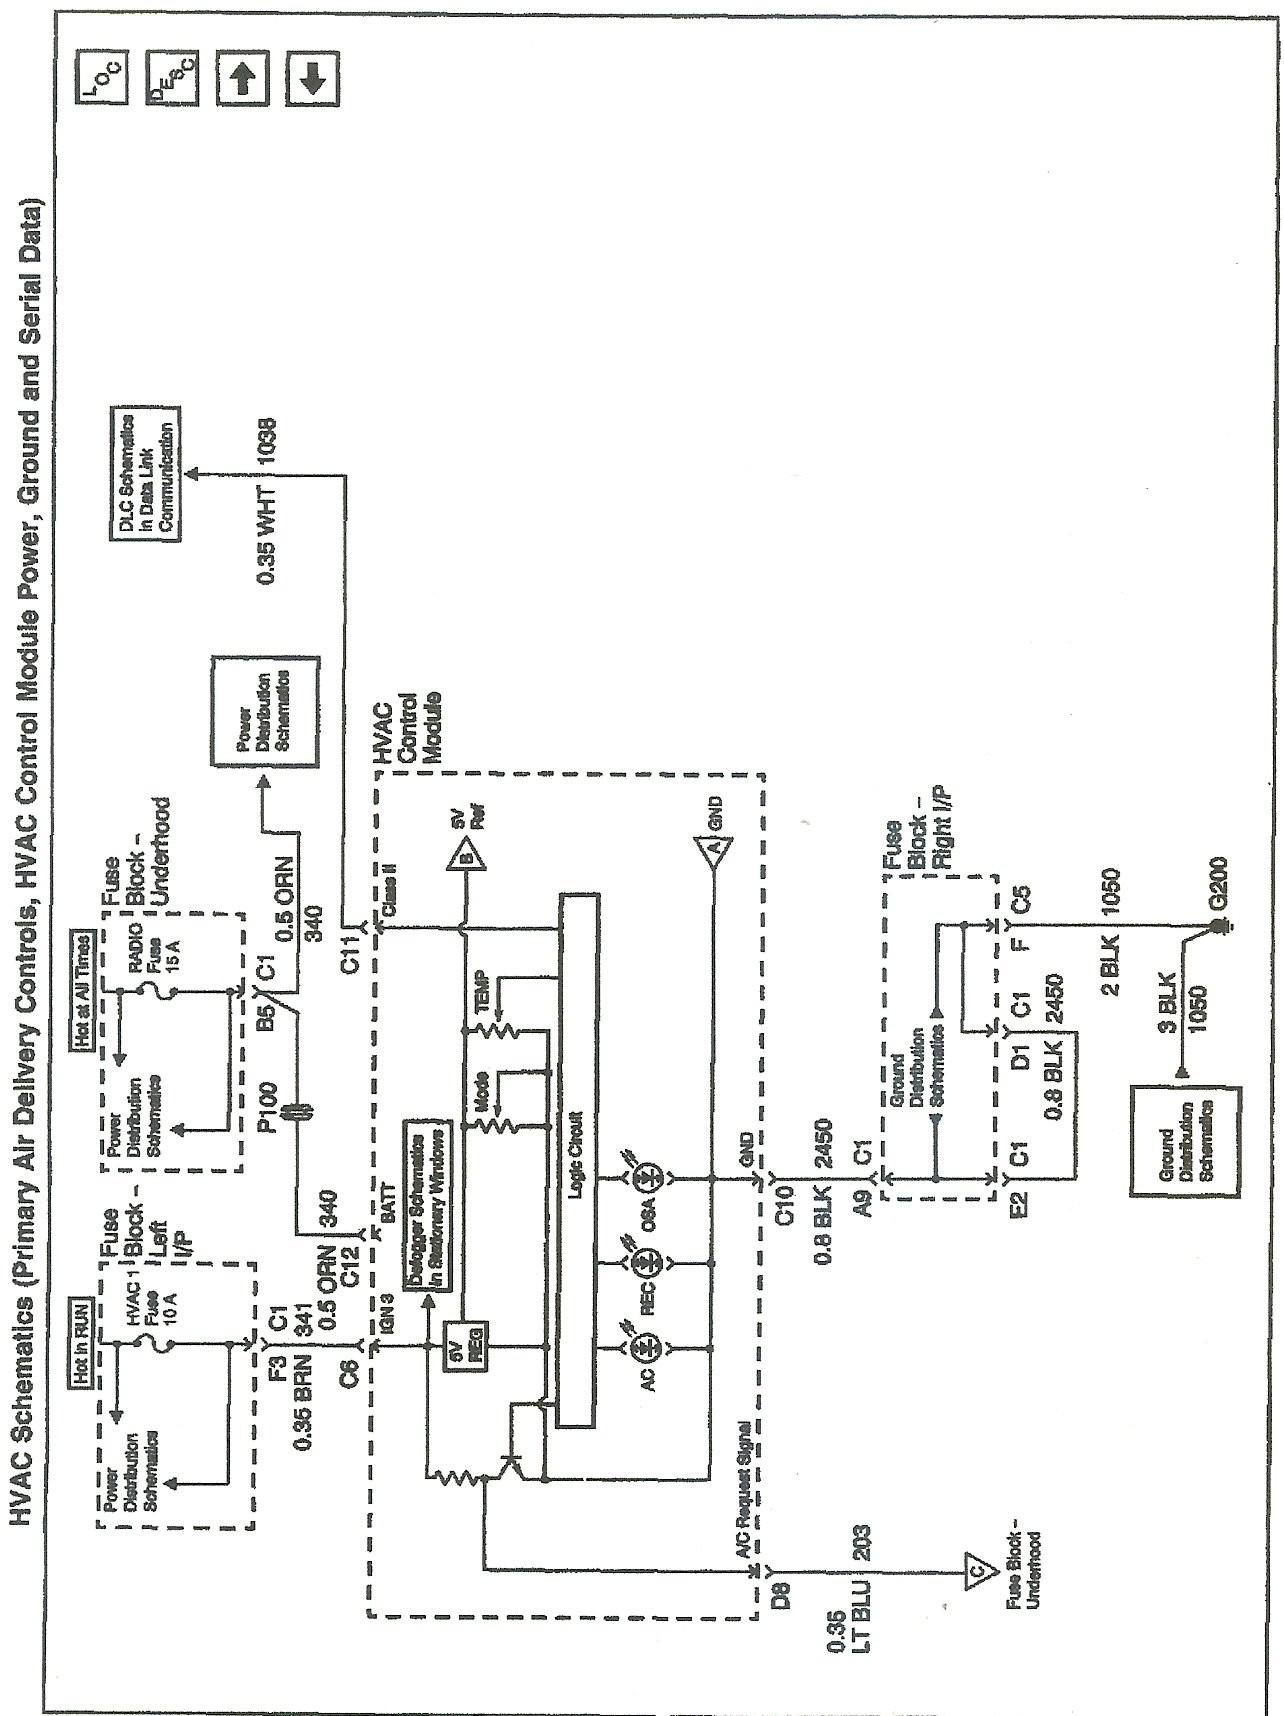 Jd 345 Electrical Diagram 14f82 1998 Lexus Sc400 Wiring Diagram Of Jd 345 Electrical Diagram